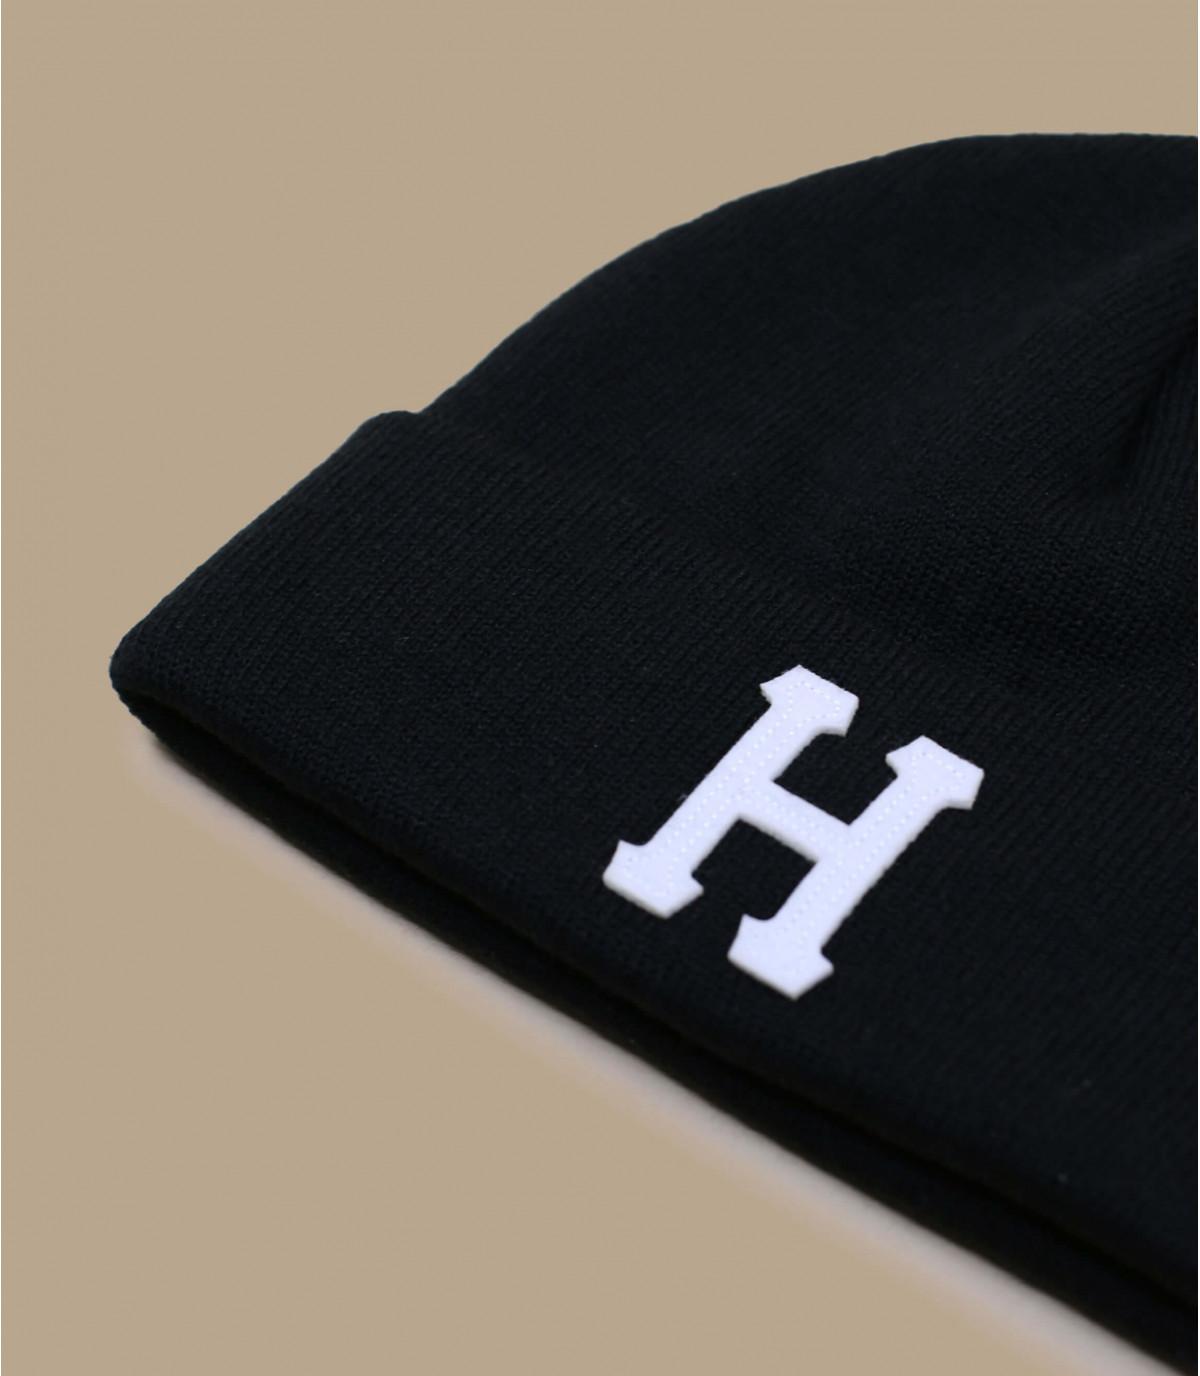 solapa gorro negro H - Classic H Beanie black de Huf. Headict ba6899f2fd0